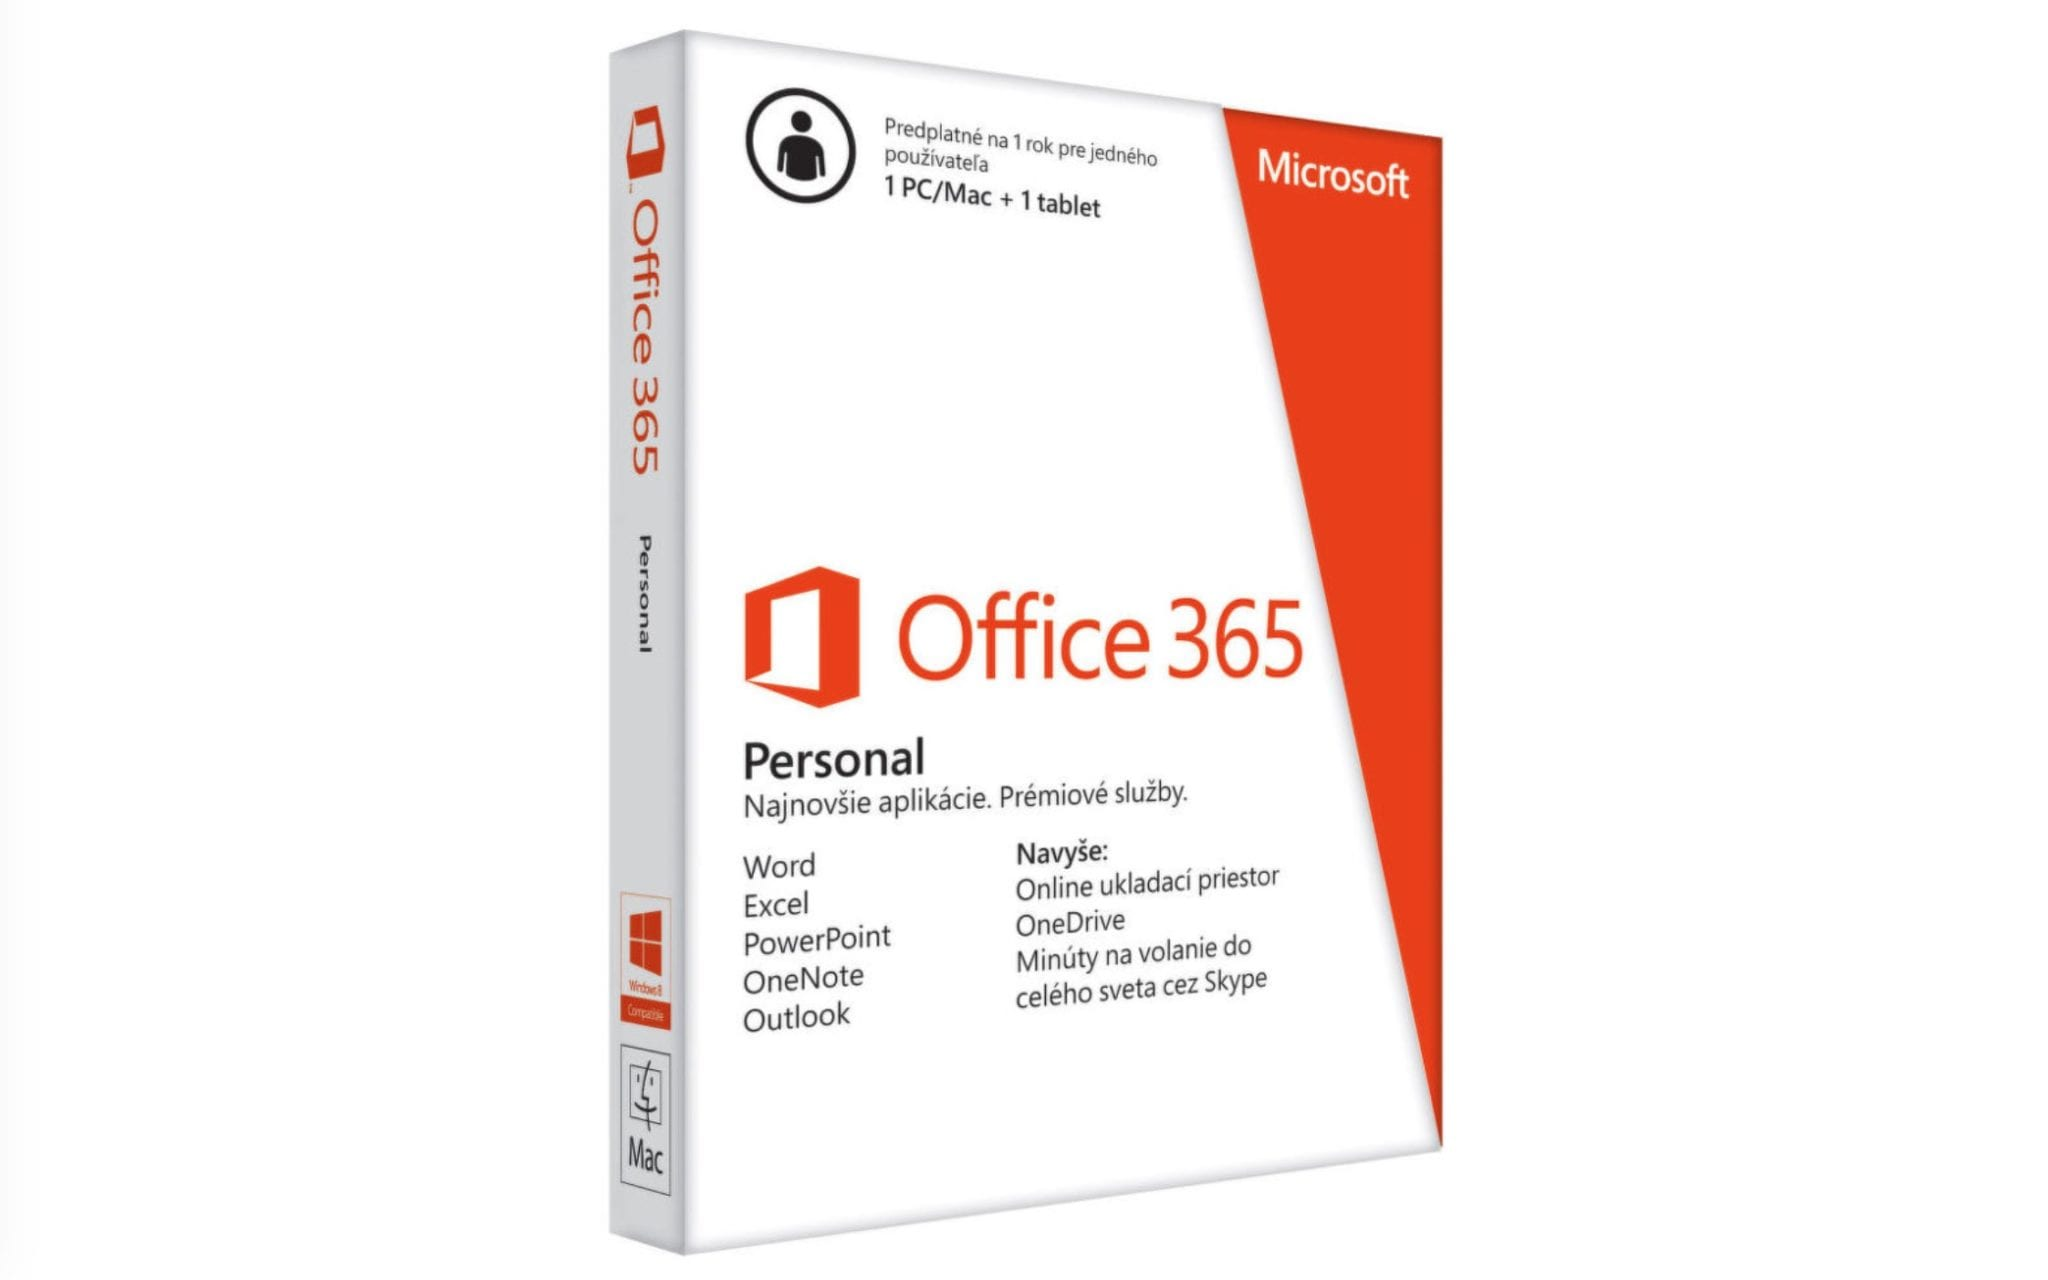 office-365-retail-box